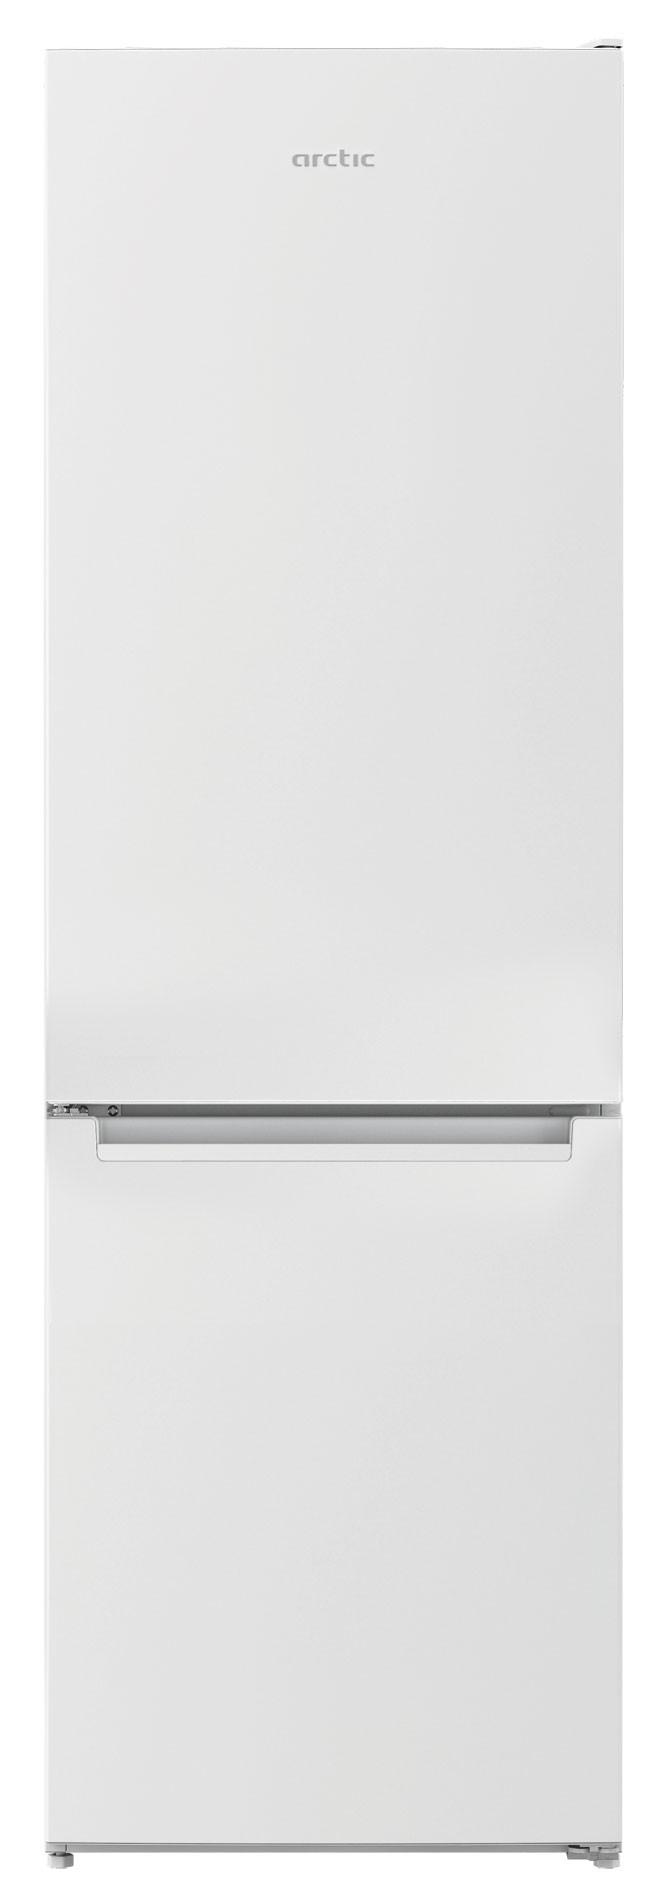 Combina frigorifica Arctic AK54270P+